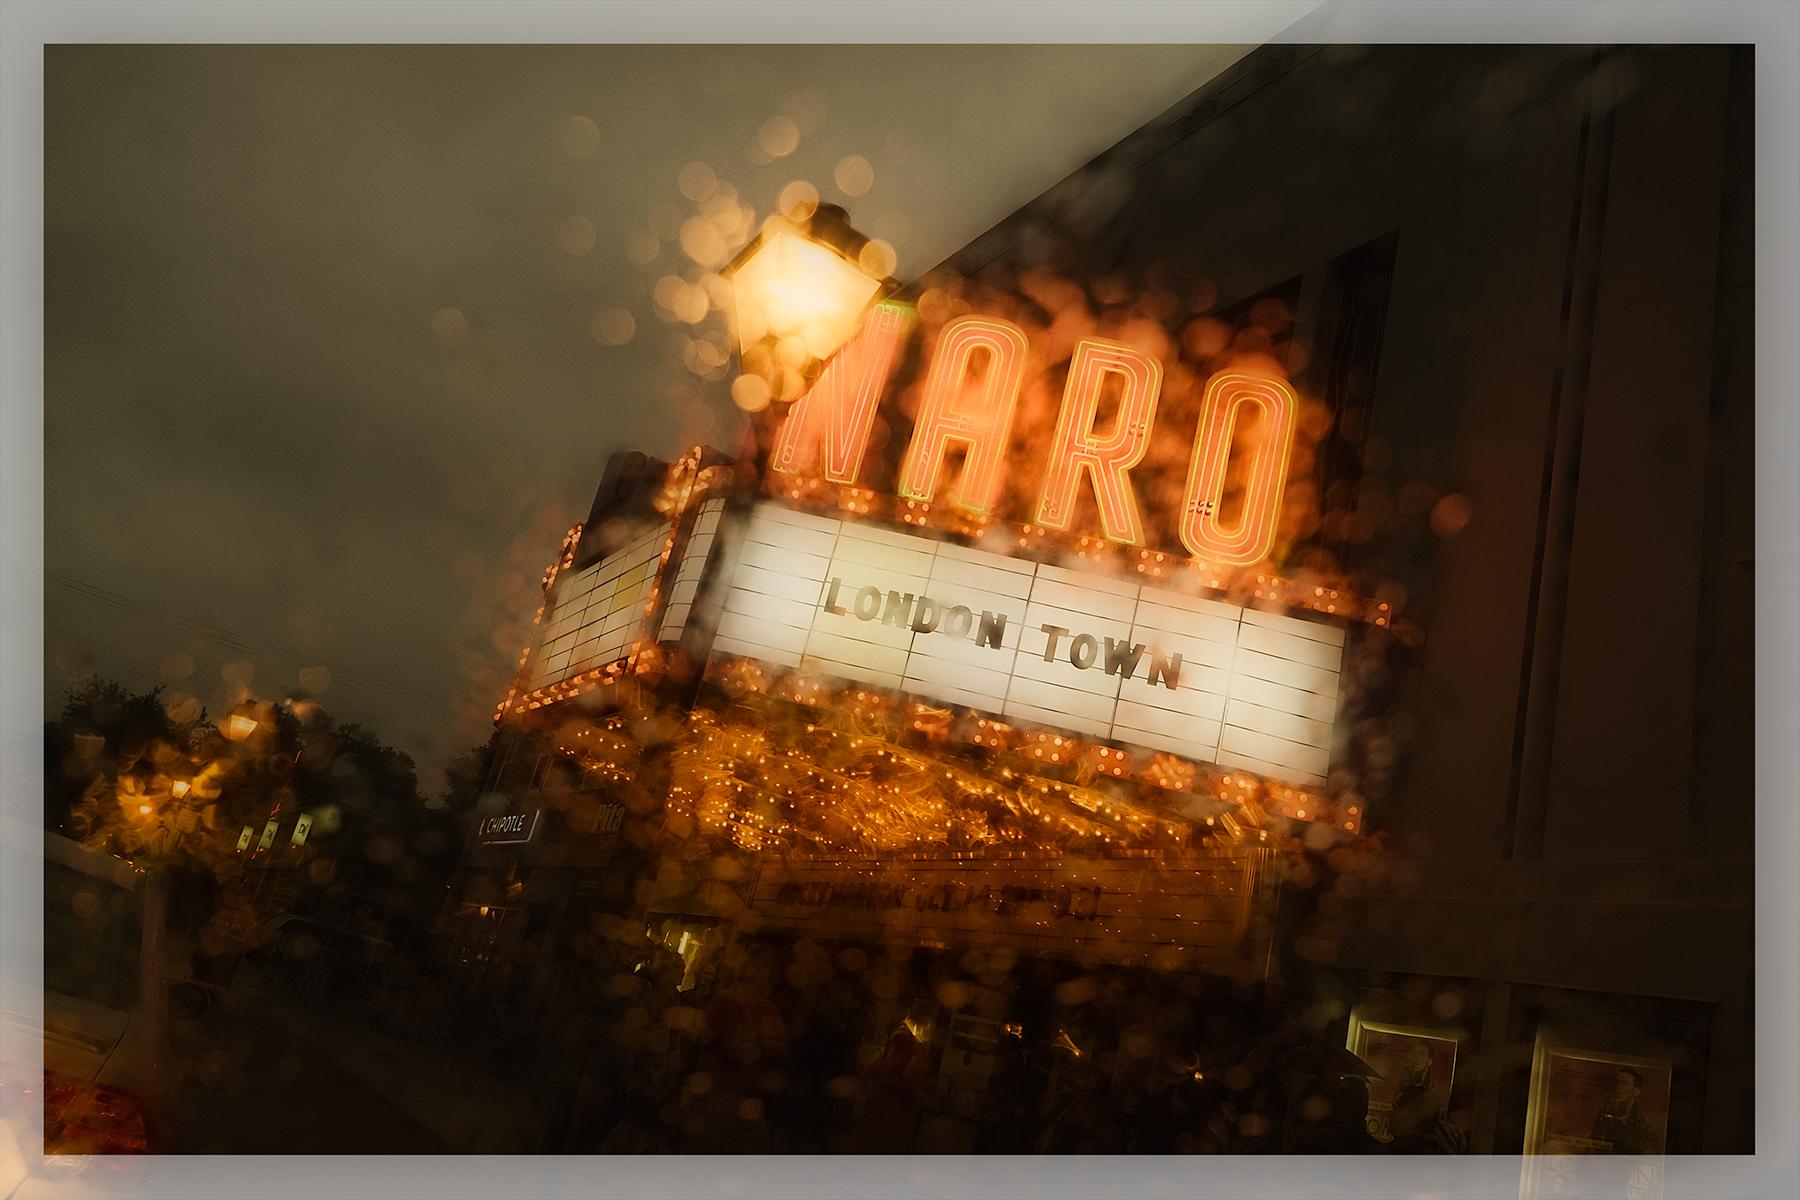 London Town Premiere, the Naro Theater, Norfolk, Va